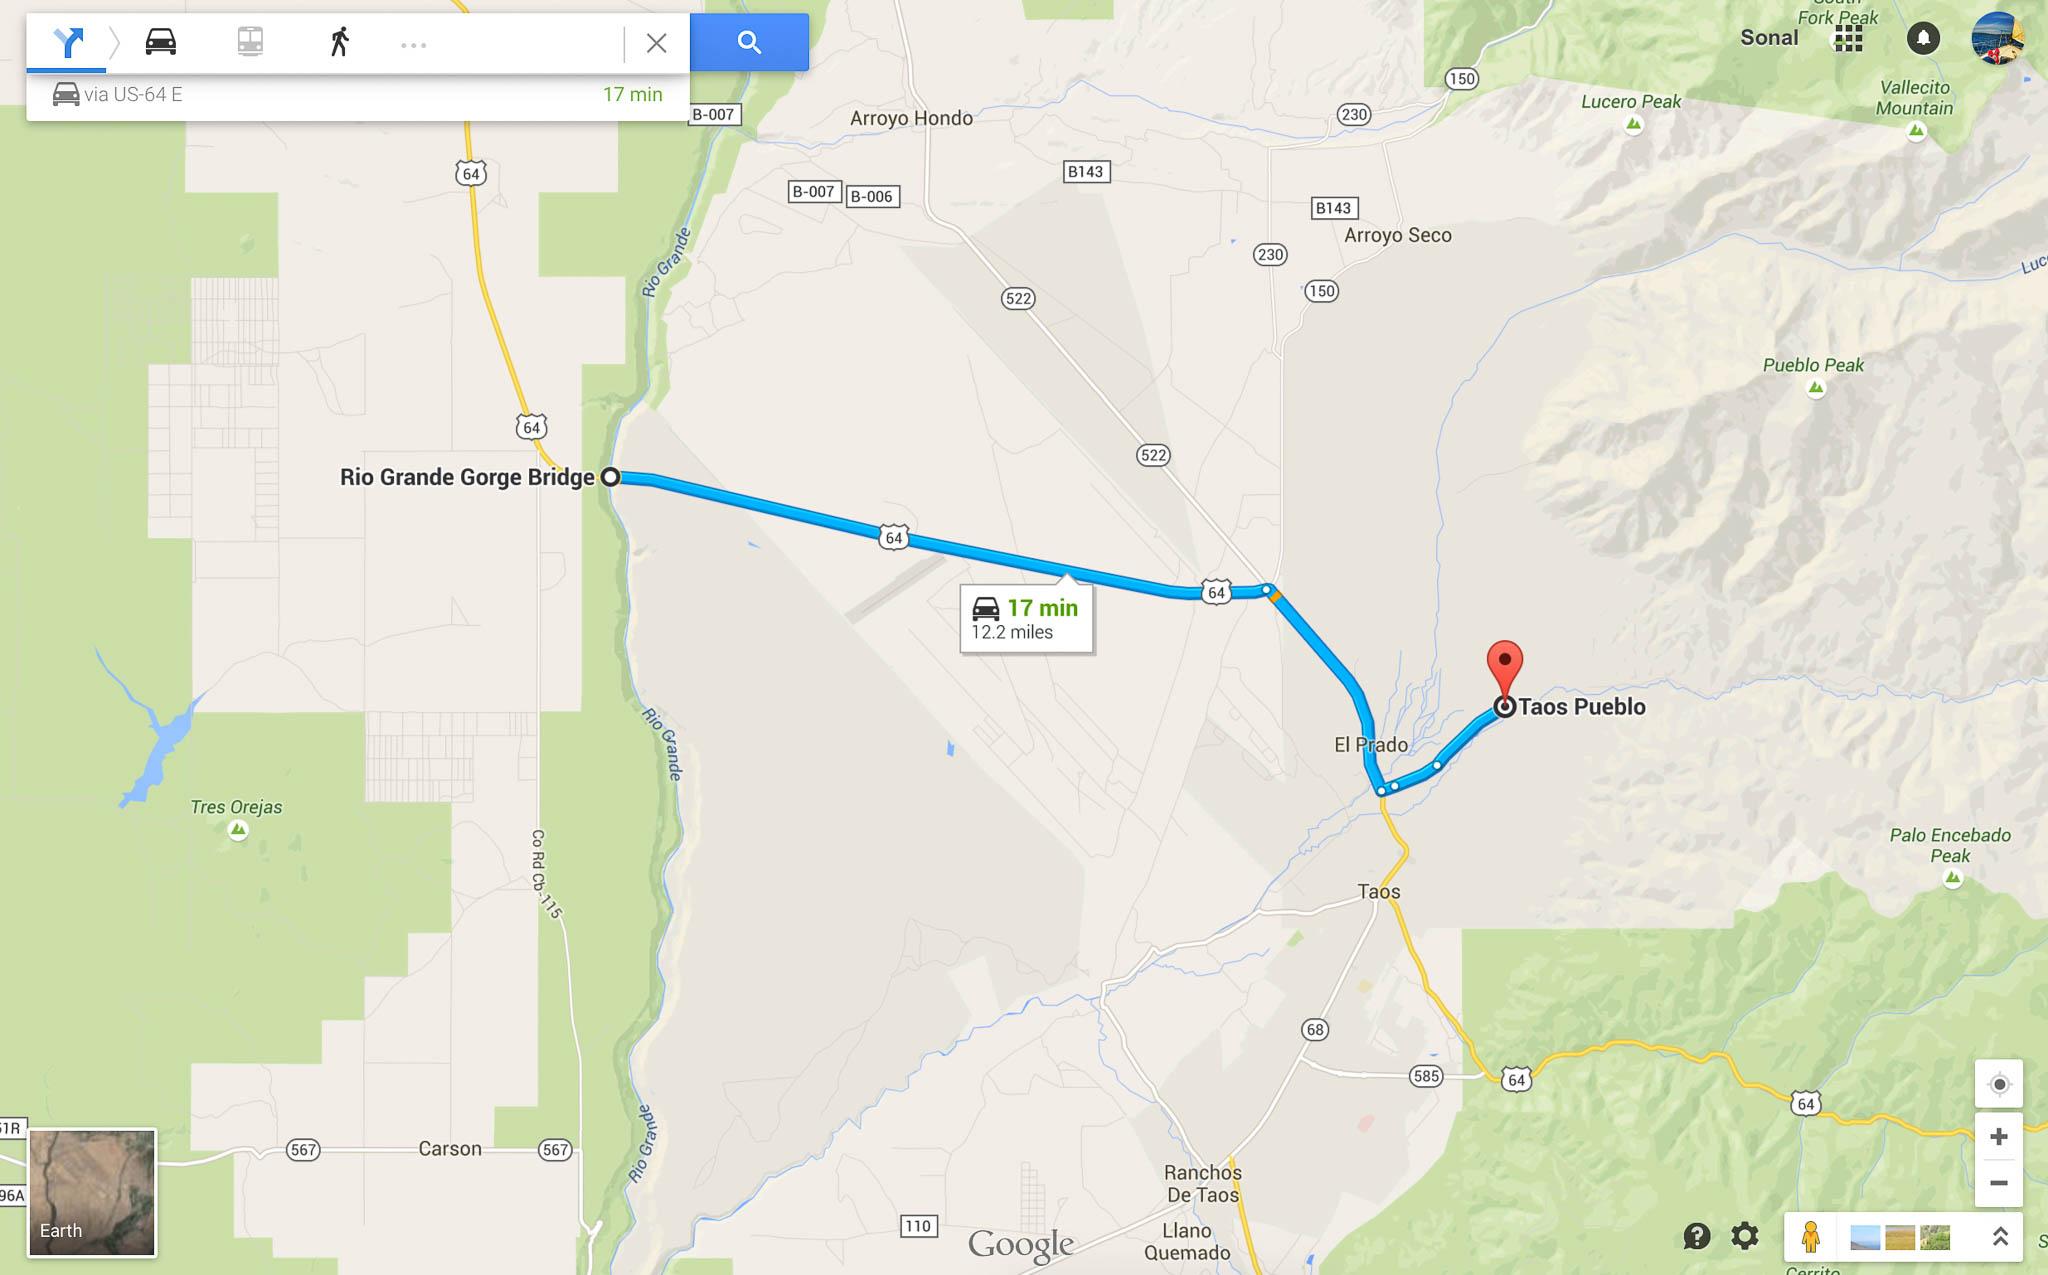 Direction from Rio Grande Gorge Bridge to Taos Pueblo (UNESCO Word heritage site) in New Mexico